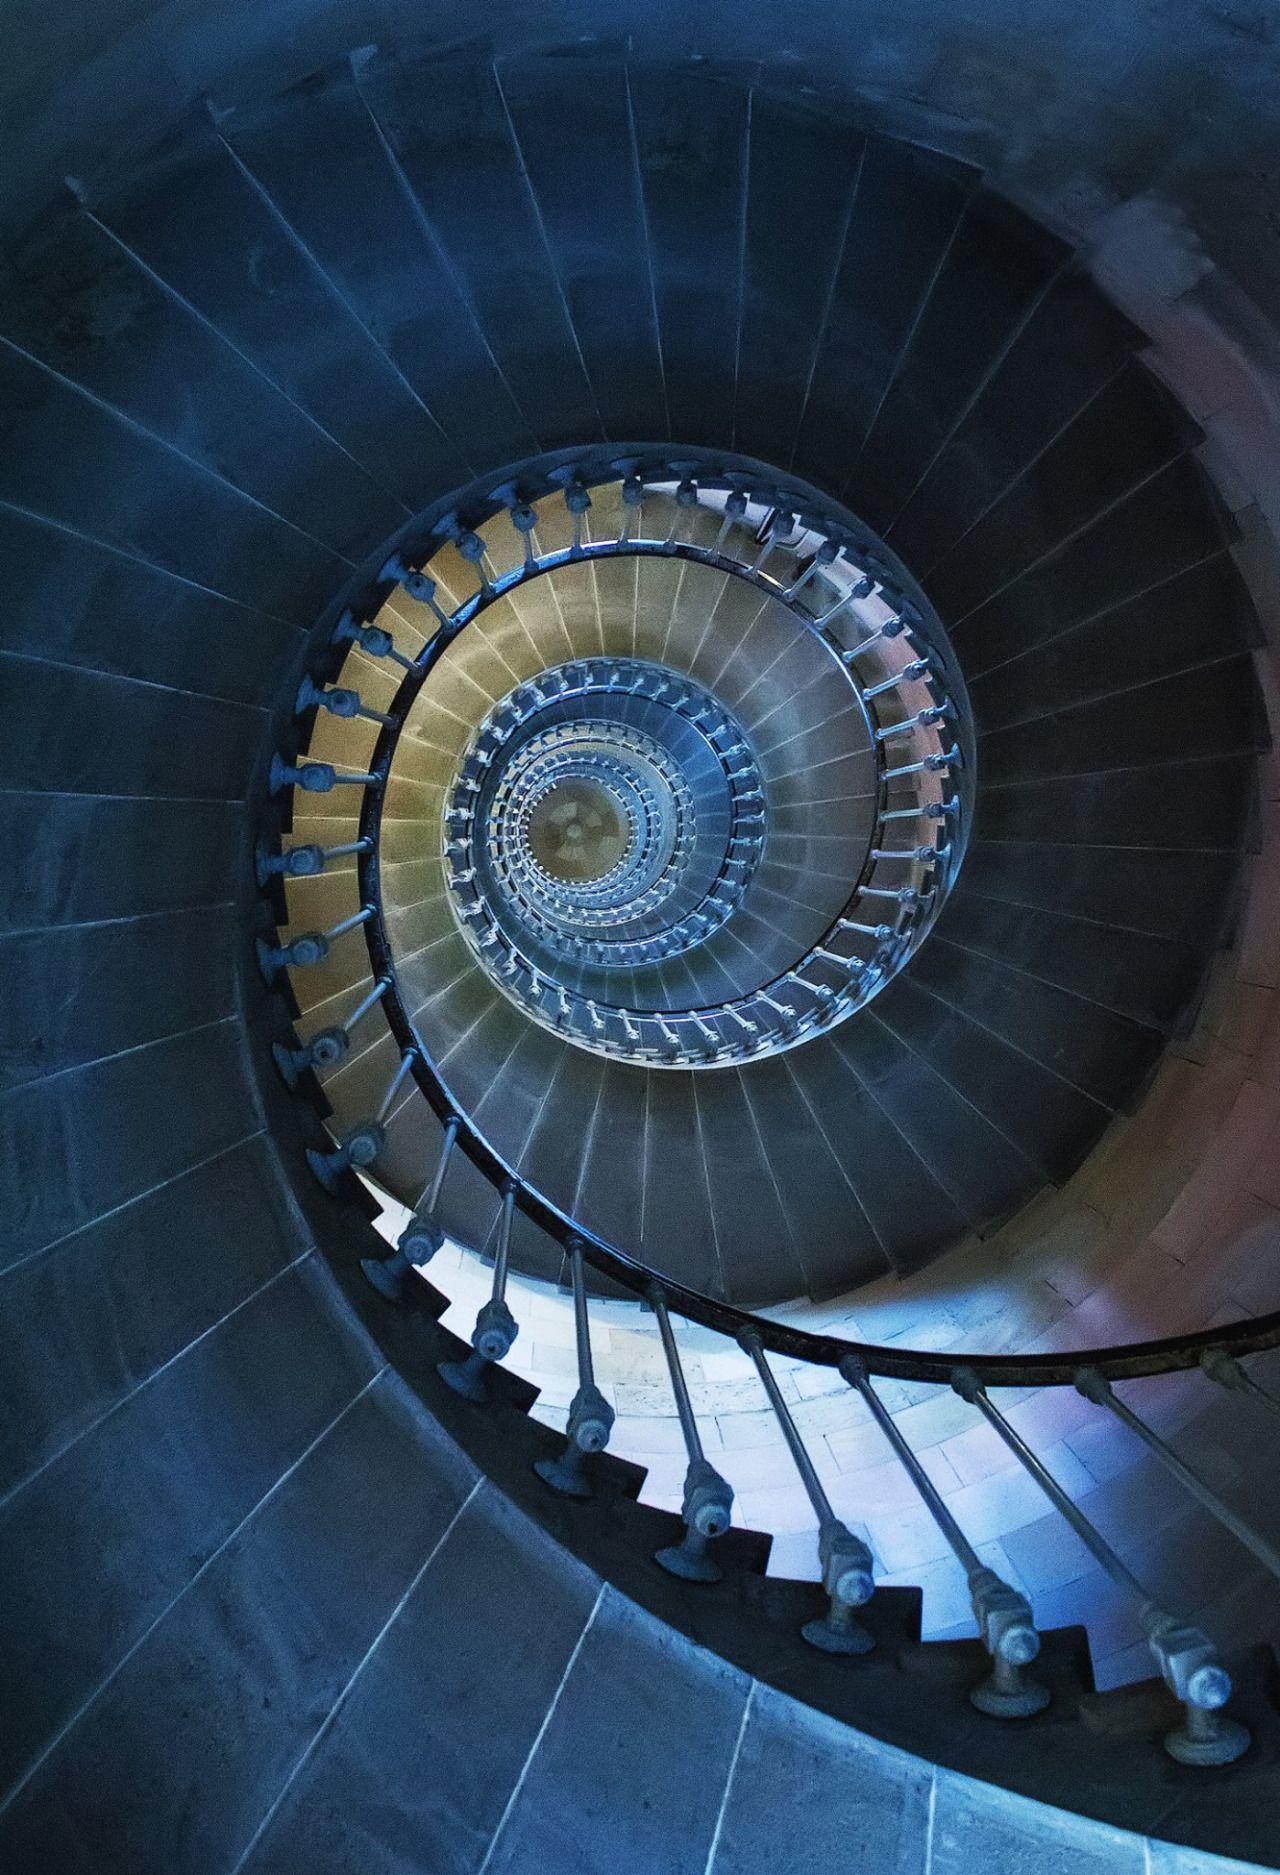 Rémi Ferreira | B L U | Pinterest | Treppe, Fraktale und Architektur